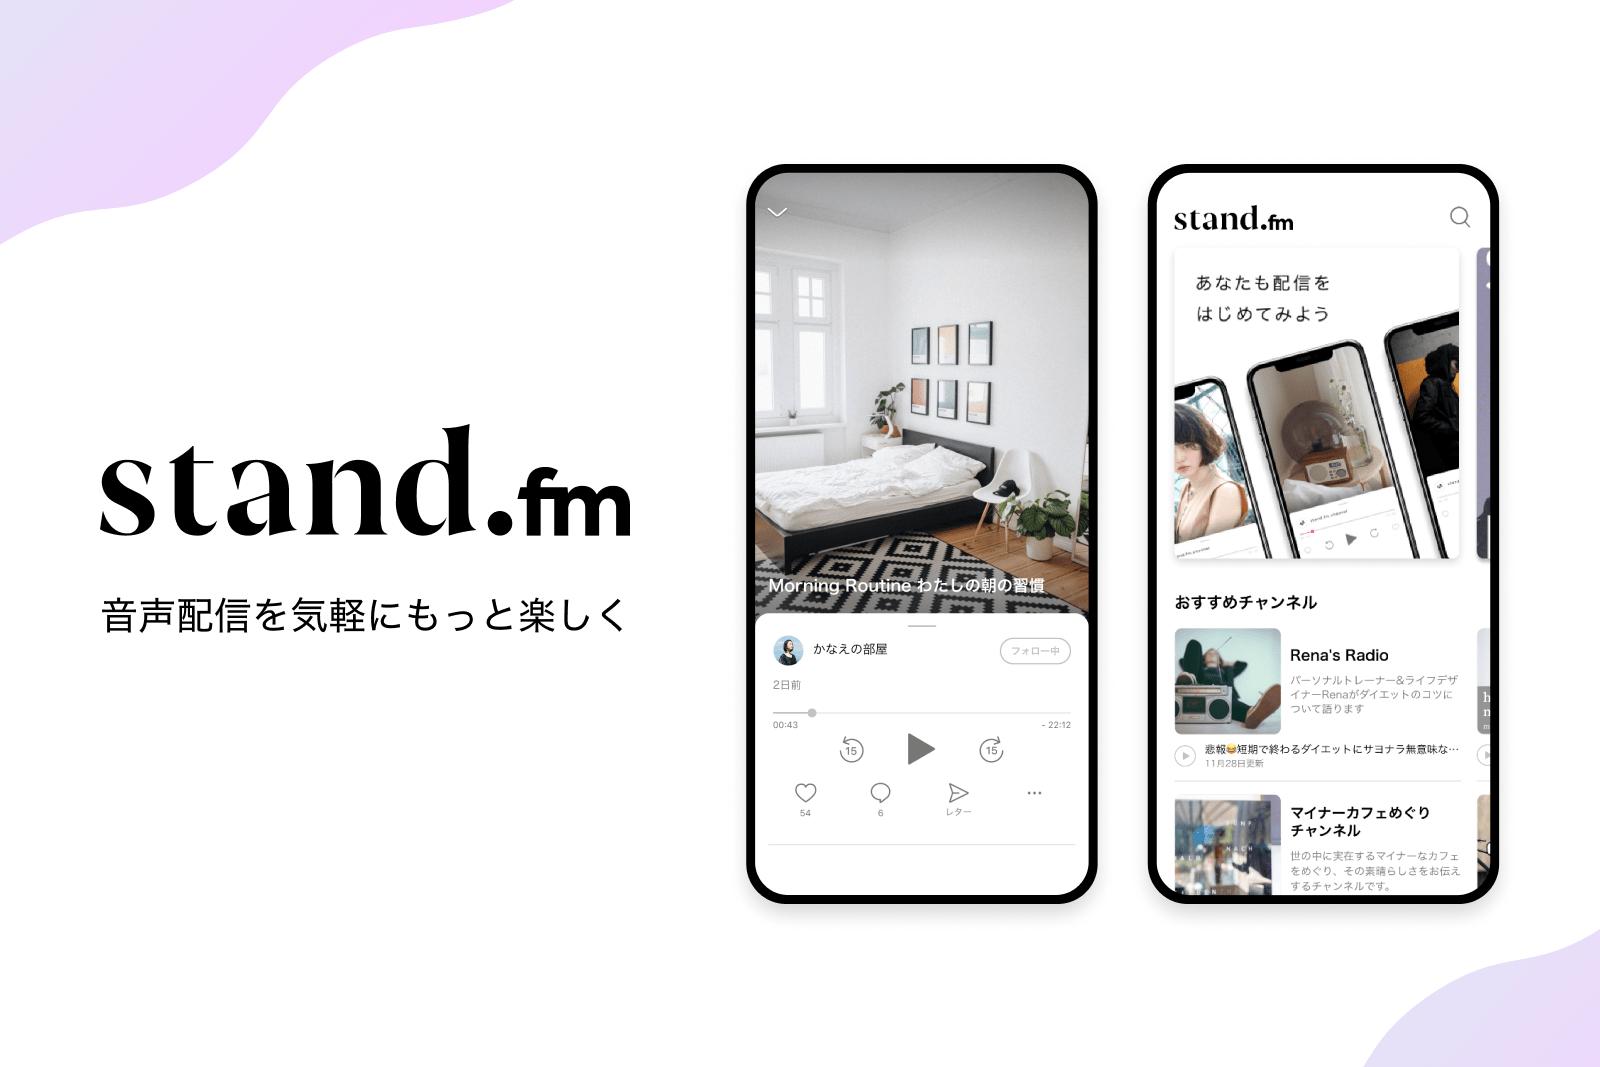 Fm stand